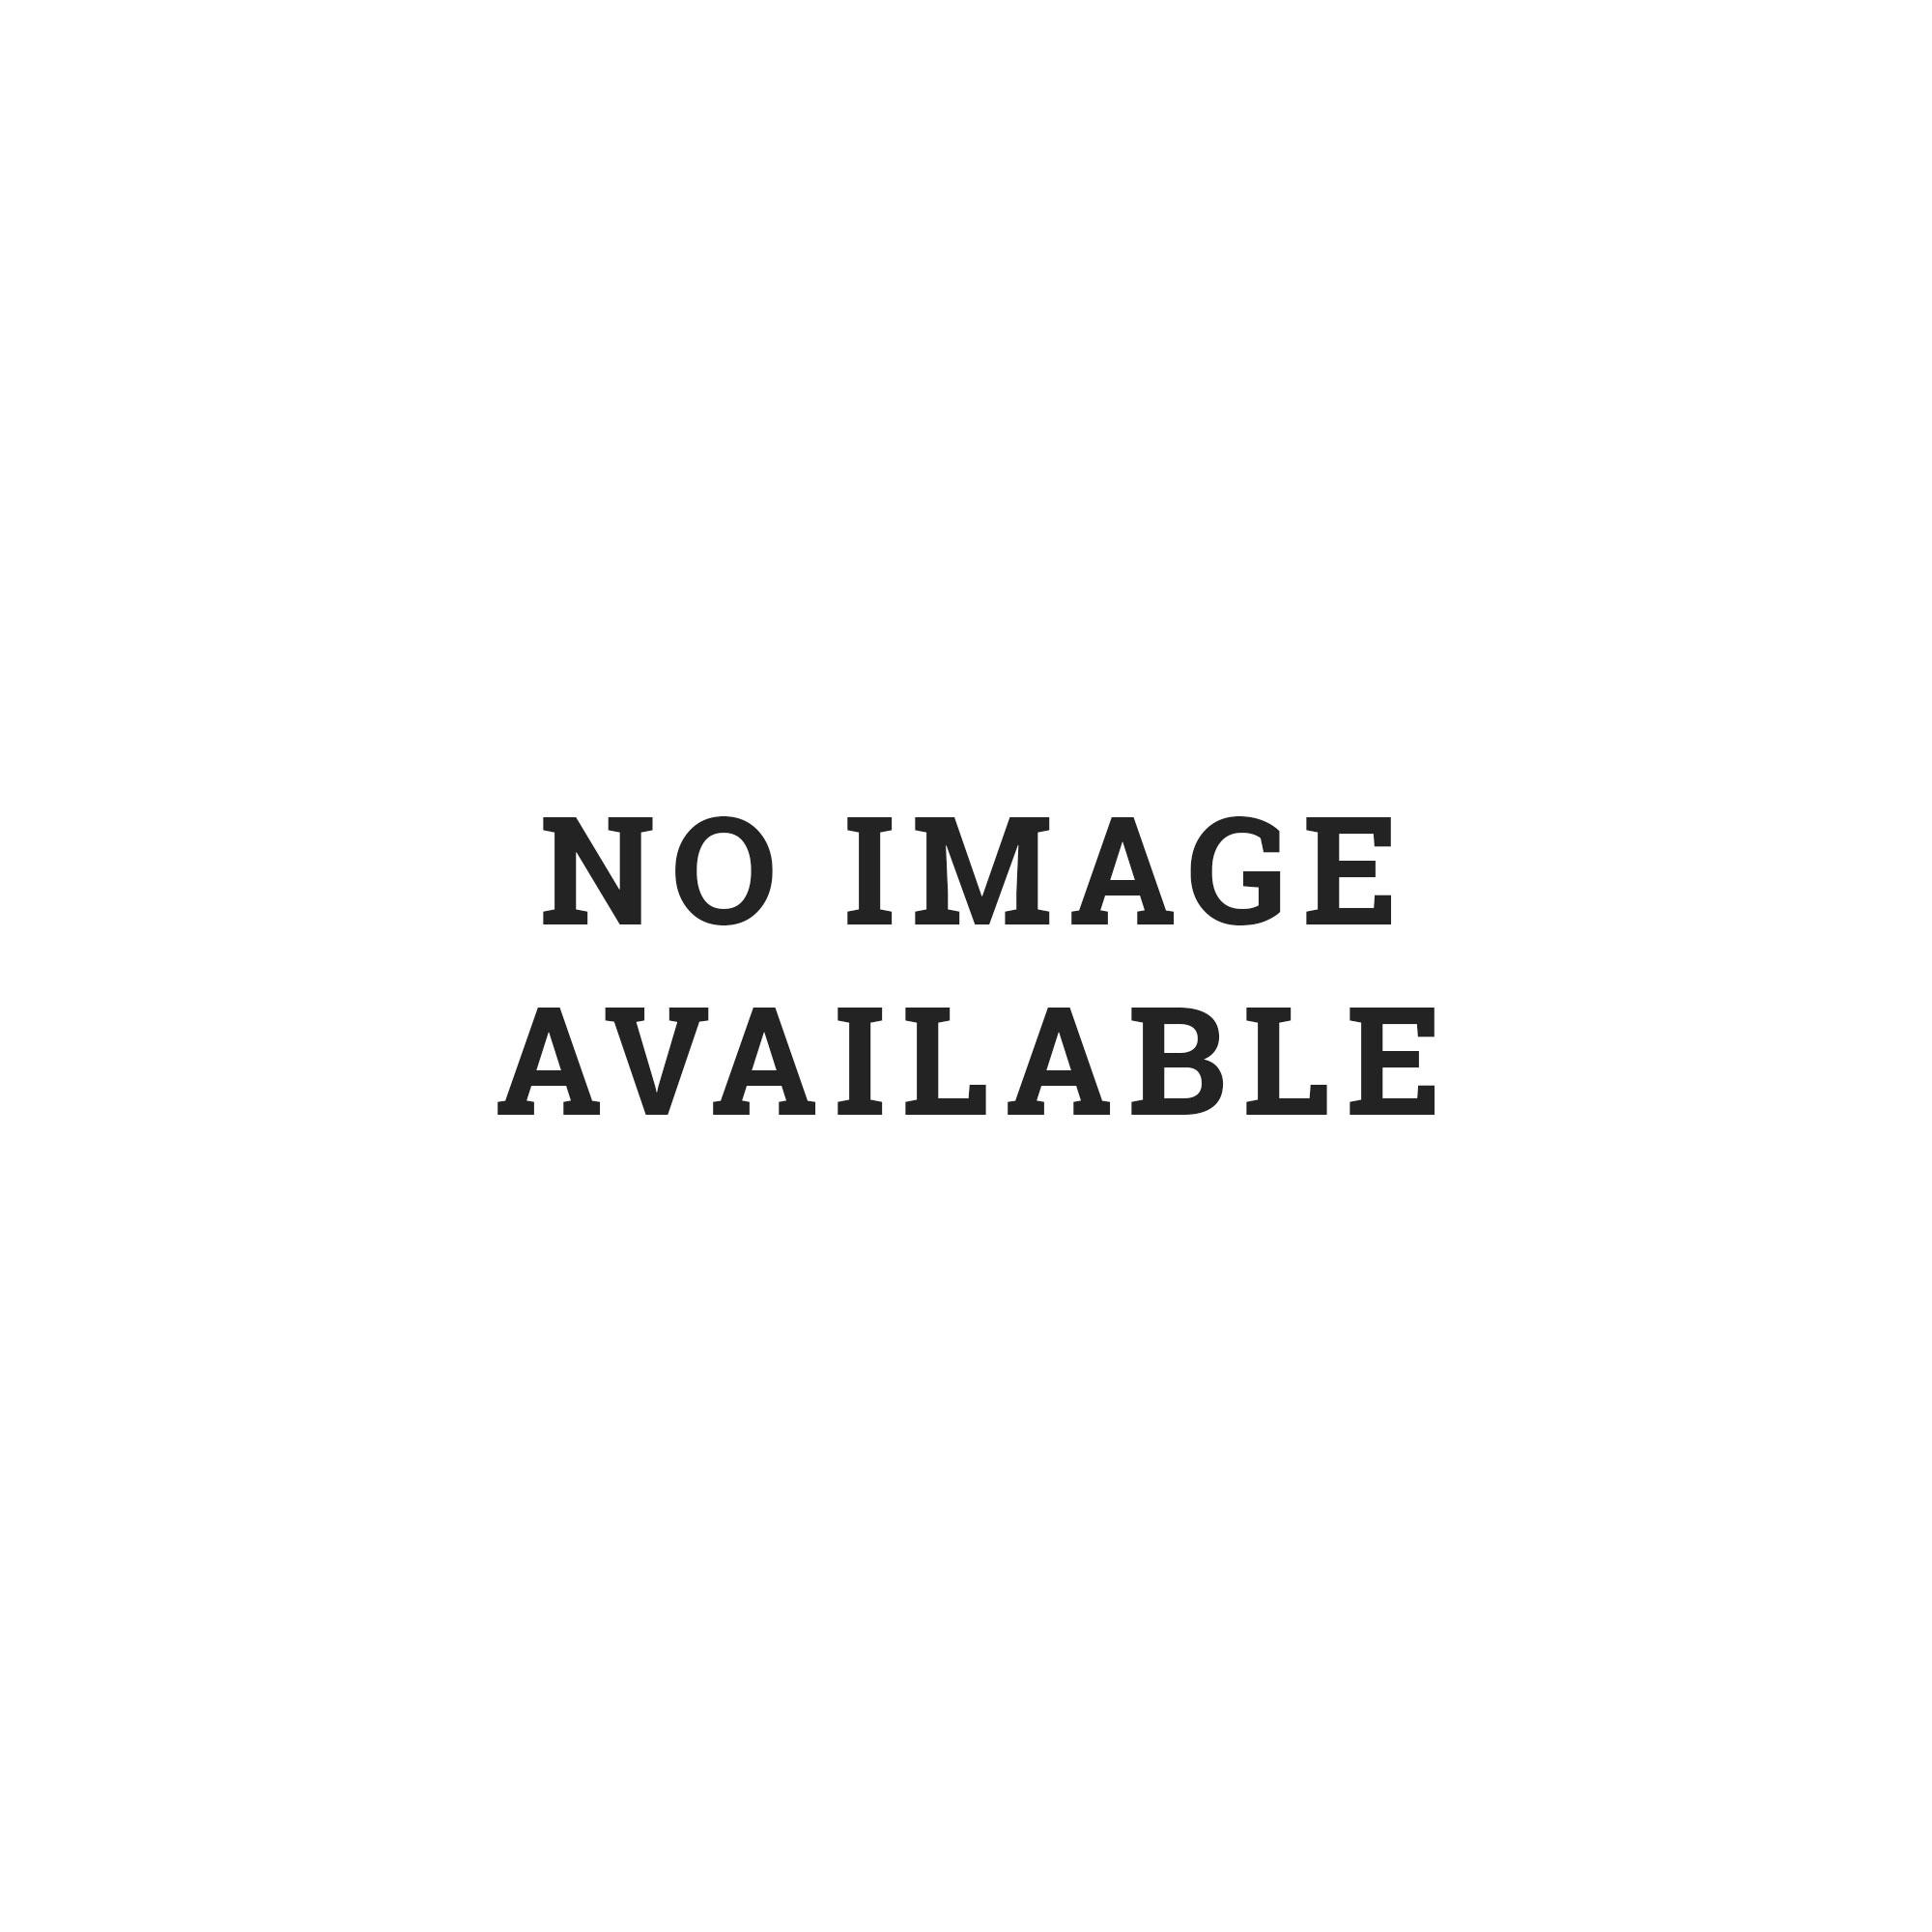 Dr Martens 1460 Unisex 8-Eyelet Python Suede Leather Boots - Black